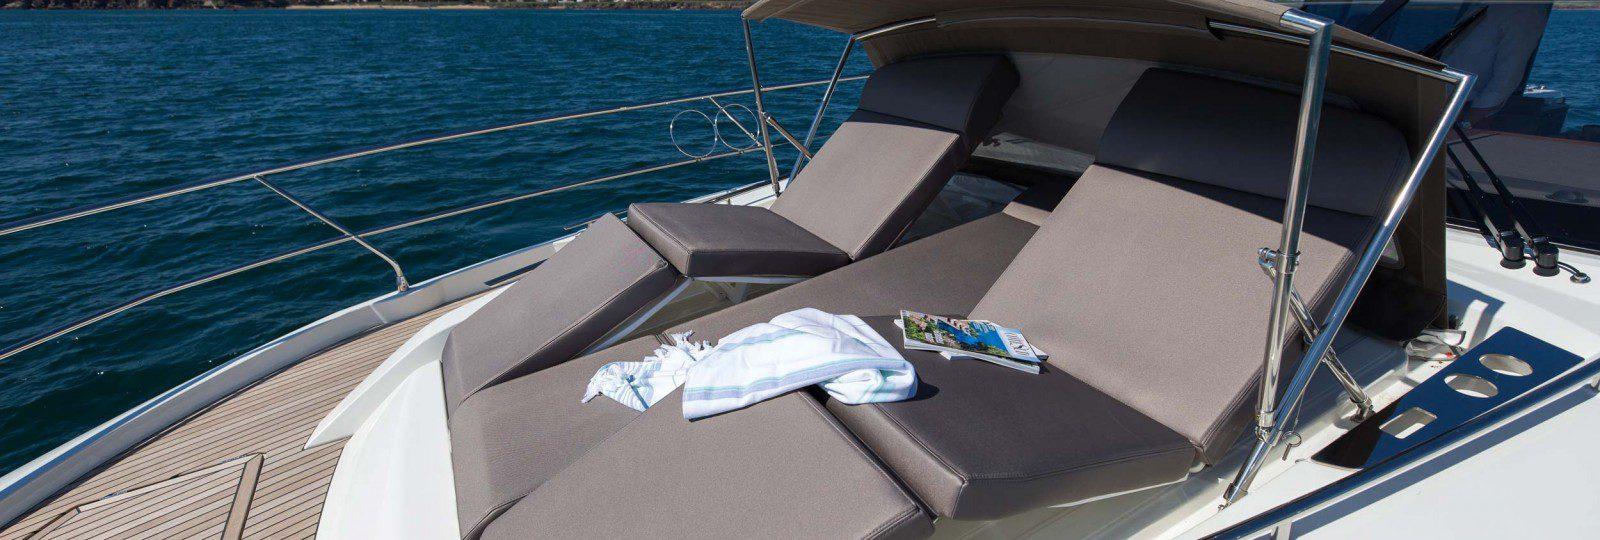 Prestige 520 sun lounger